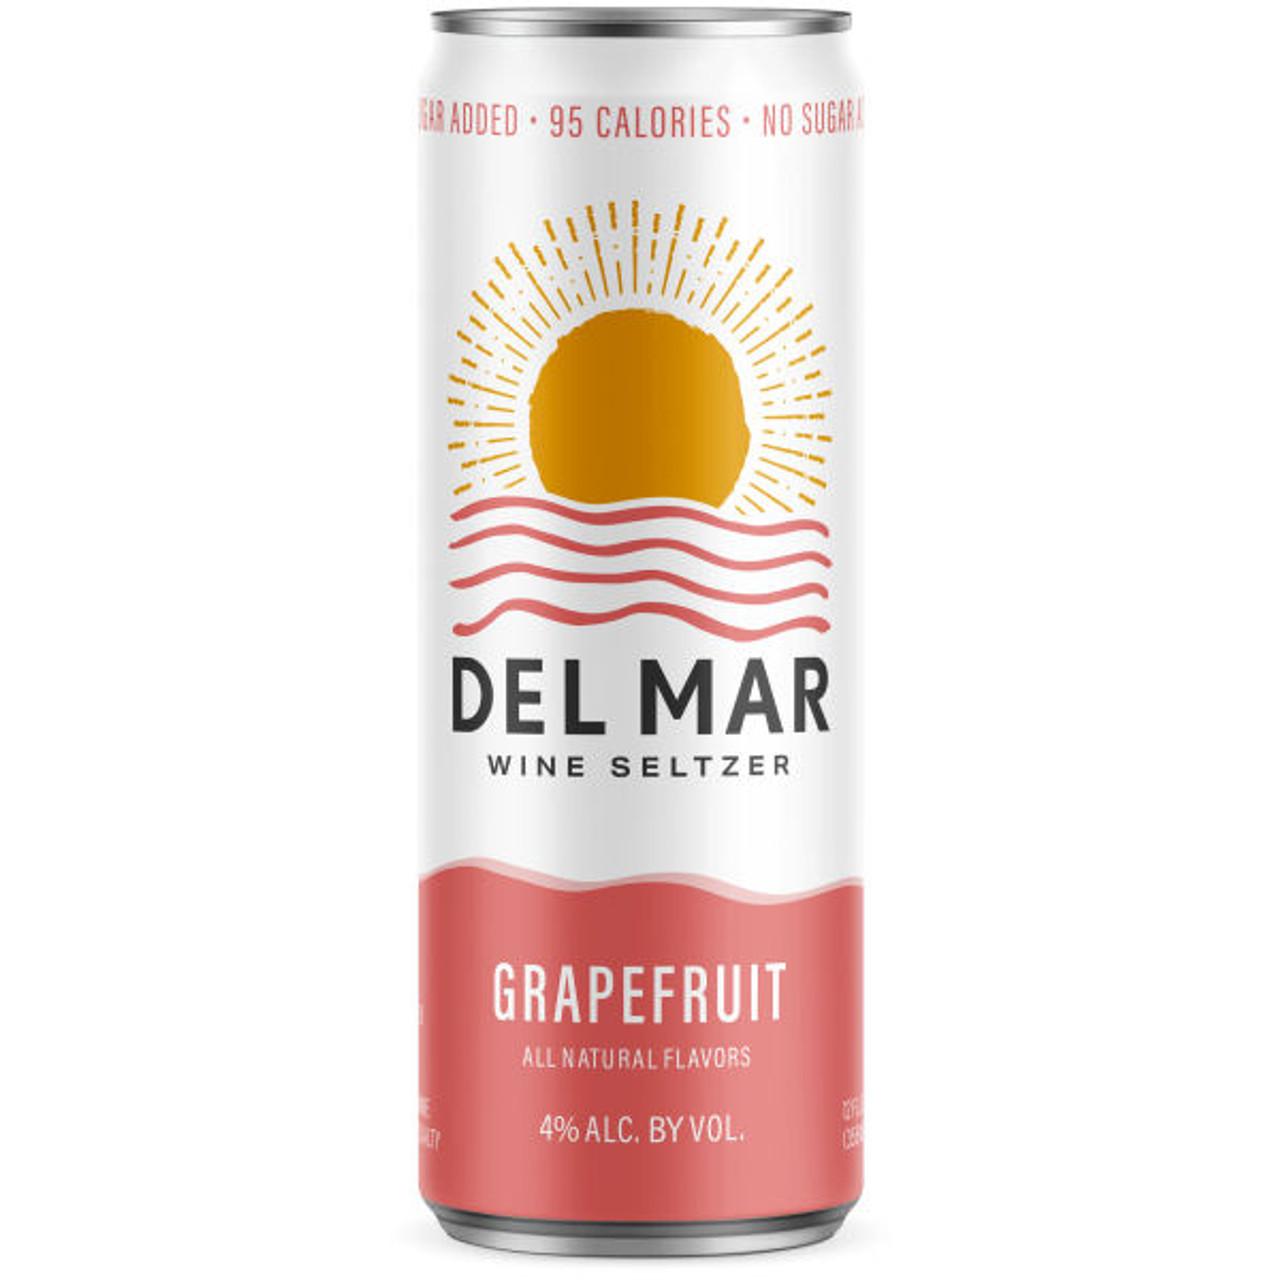 Del Mar Grapefruit Wine Seltzer 12oz 4 Pack Cans